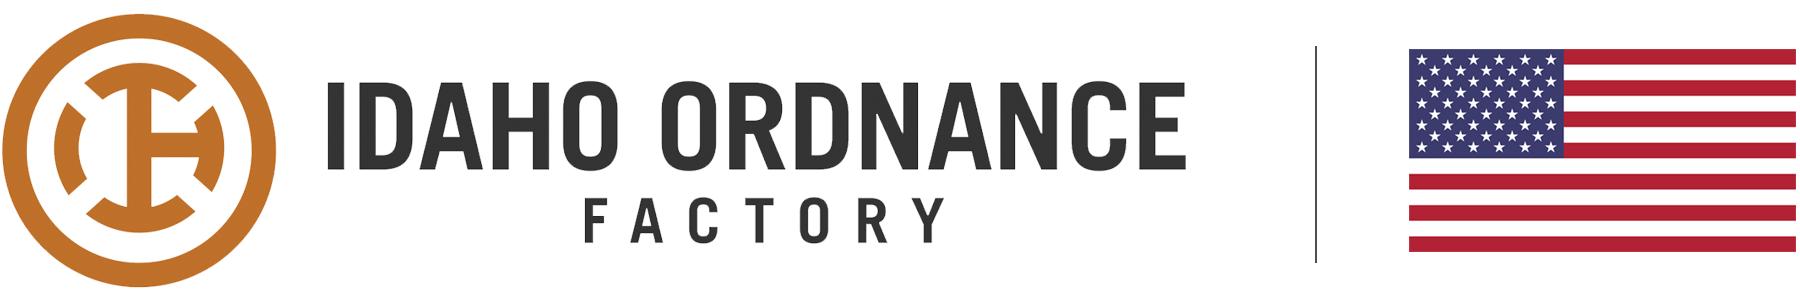 Idaho Ordnance Factory